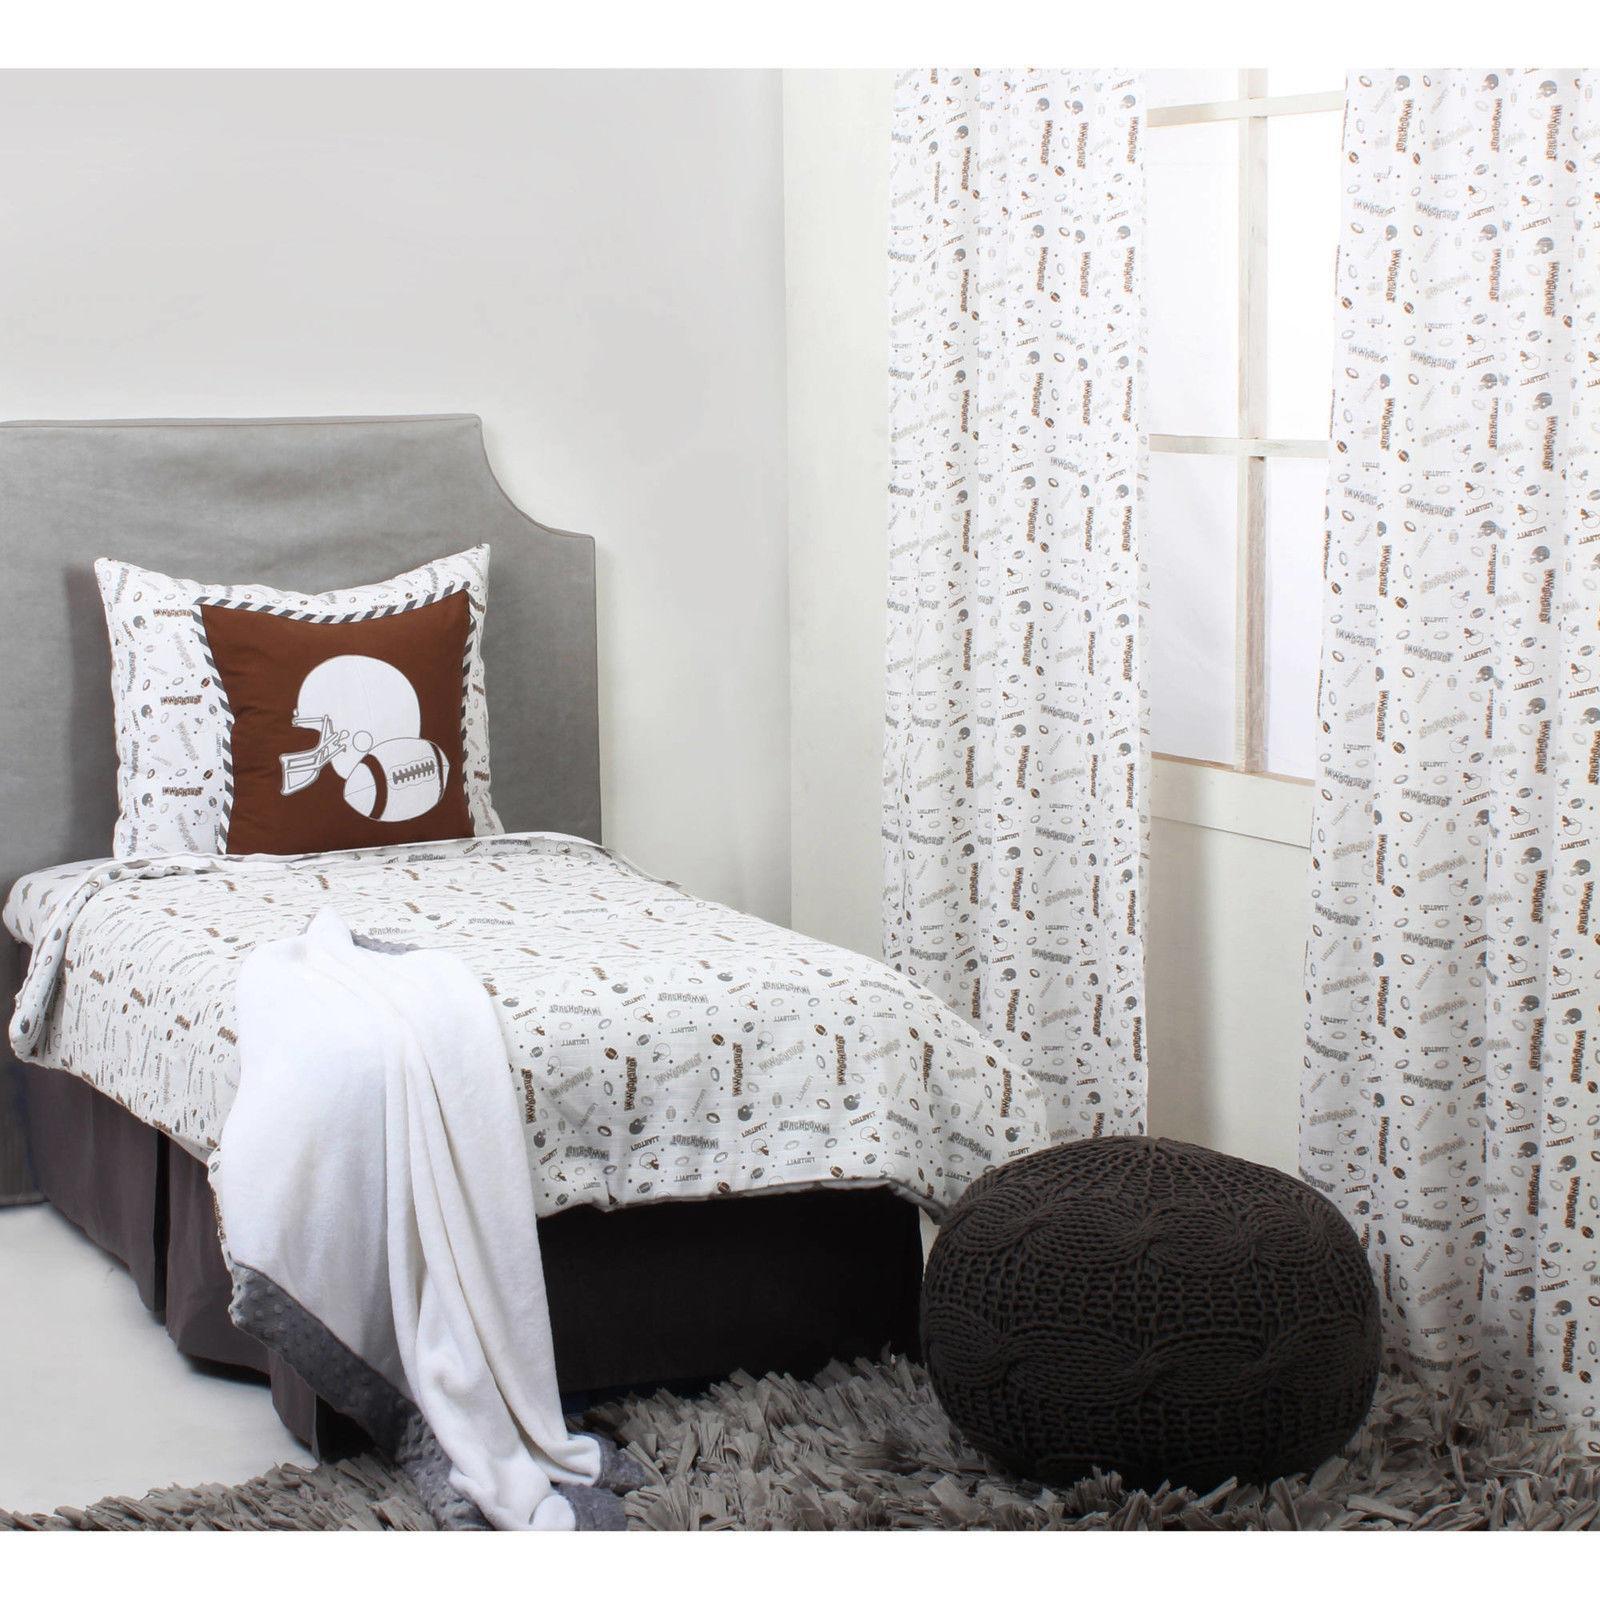 Football 4-Piece Toddler Bedding Set Kids Bed Comforter Shee